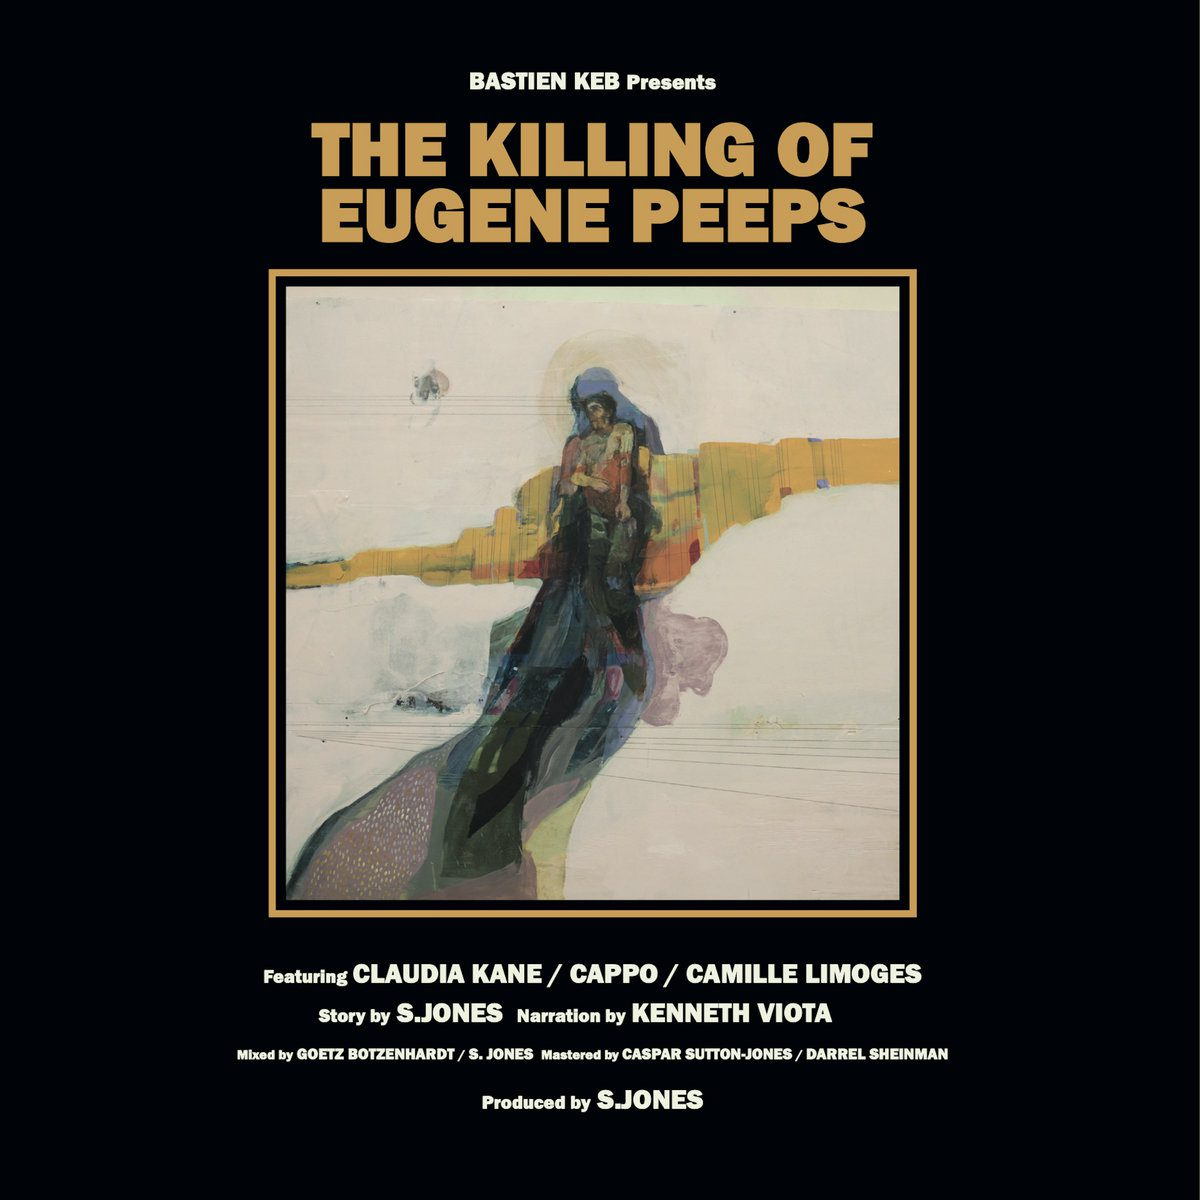 The Killing of Eugene Peeps by Bastian Keb